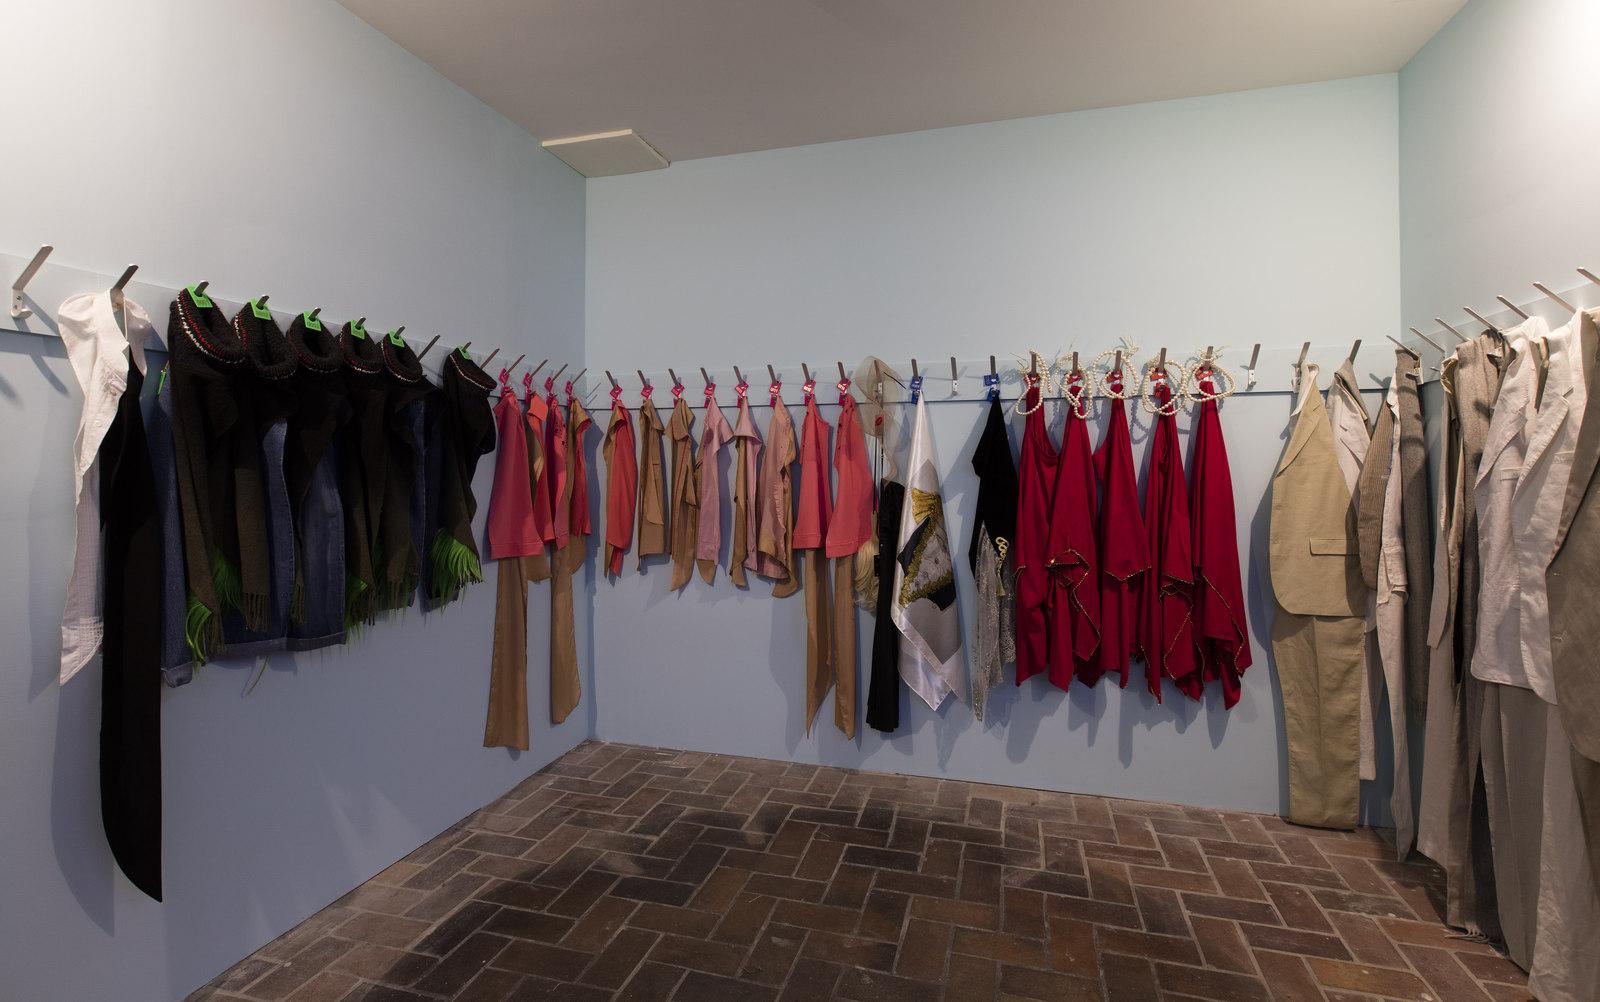 5_Costumes and Wishes Schinkel Pavillon 2016_DGF_BLESS_Manuel Raeder_Schinkelklause_Foto Andrea Rossett